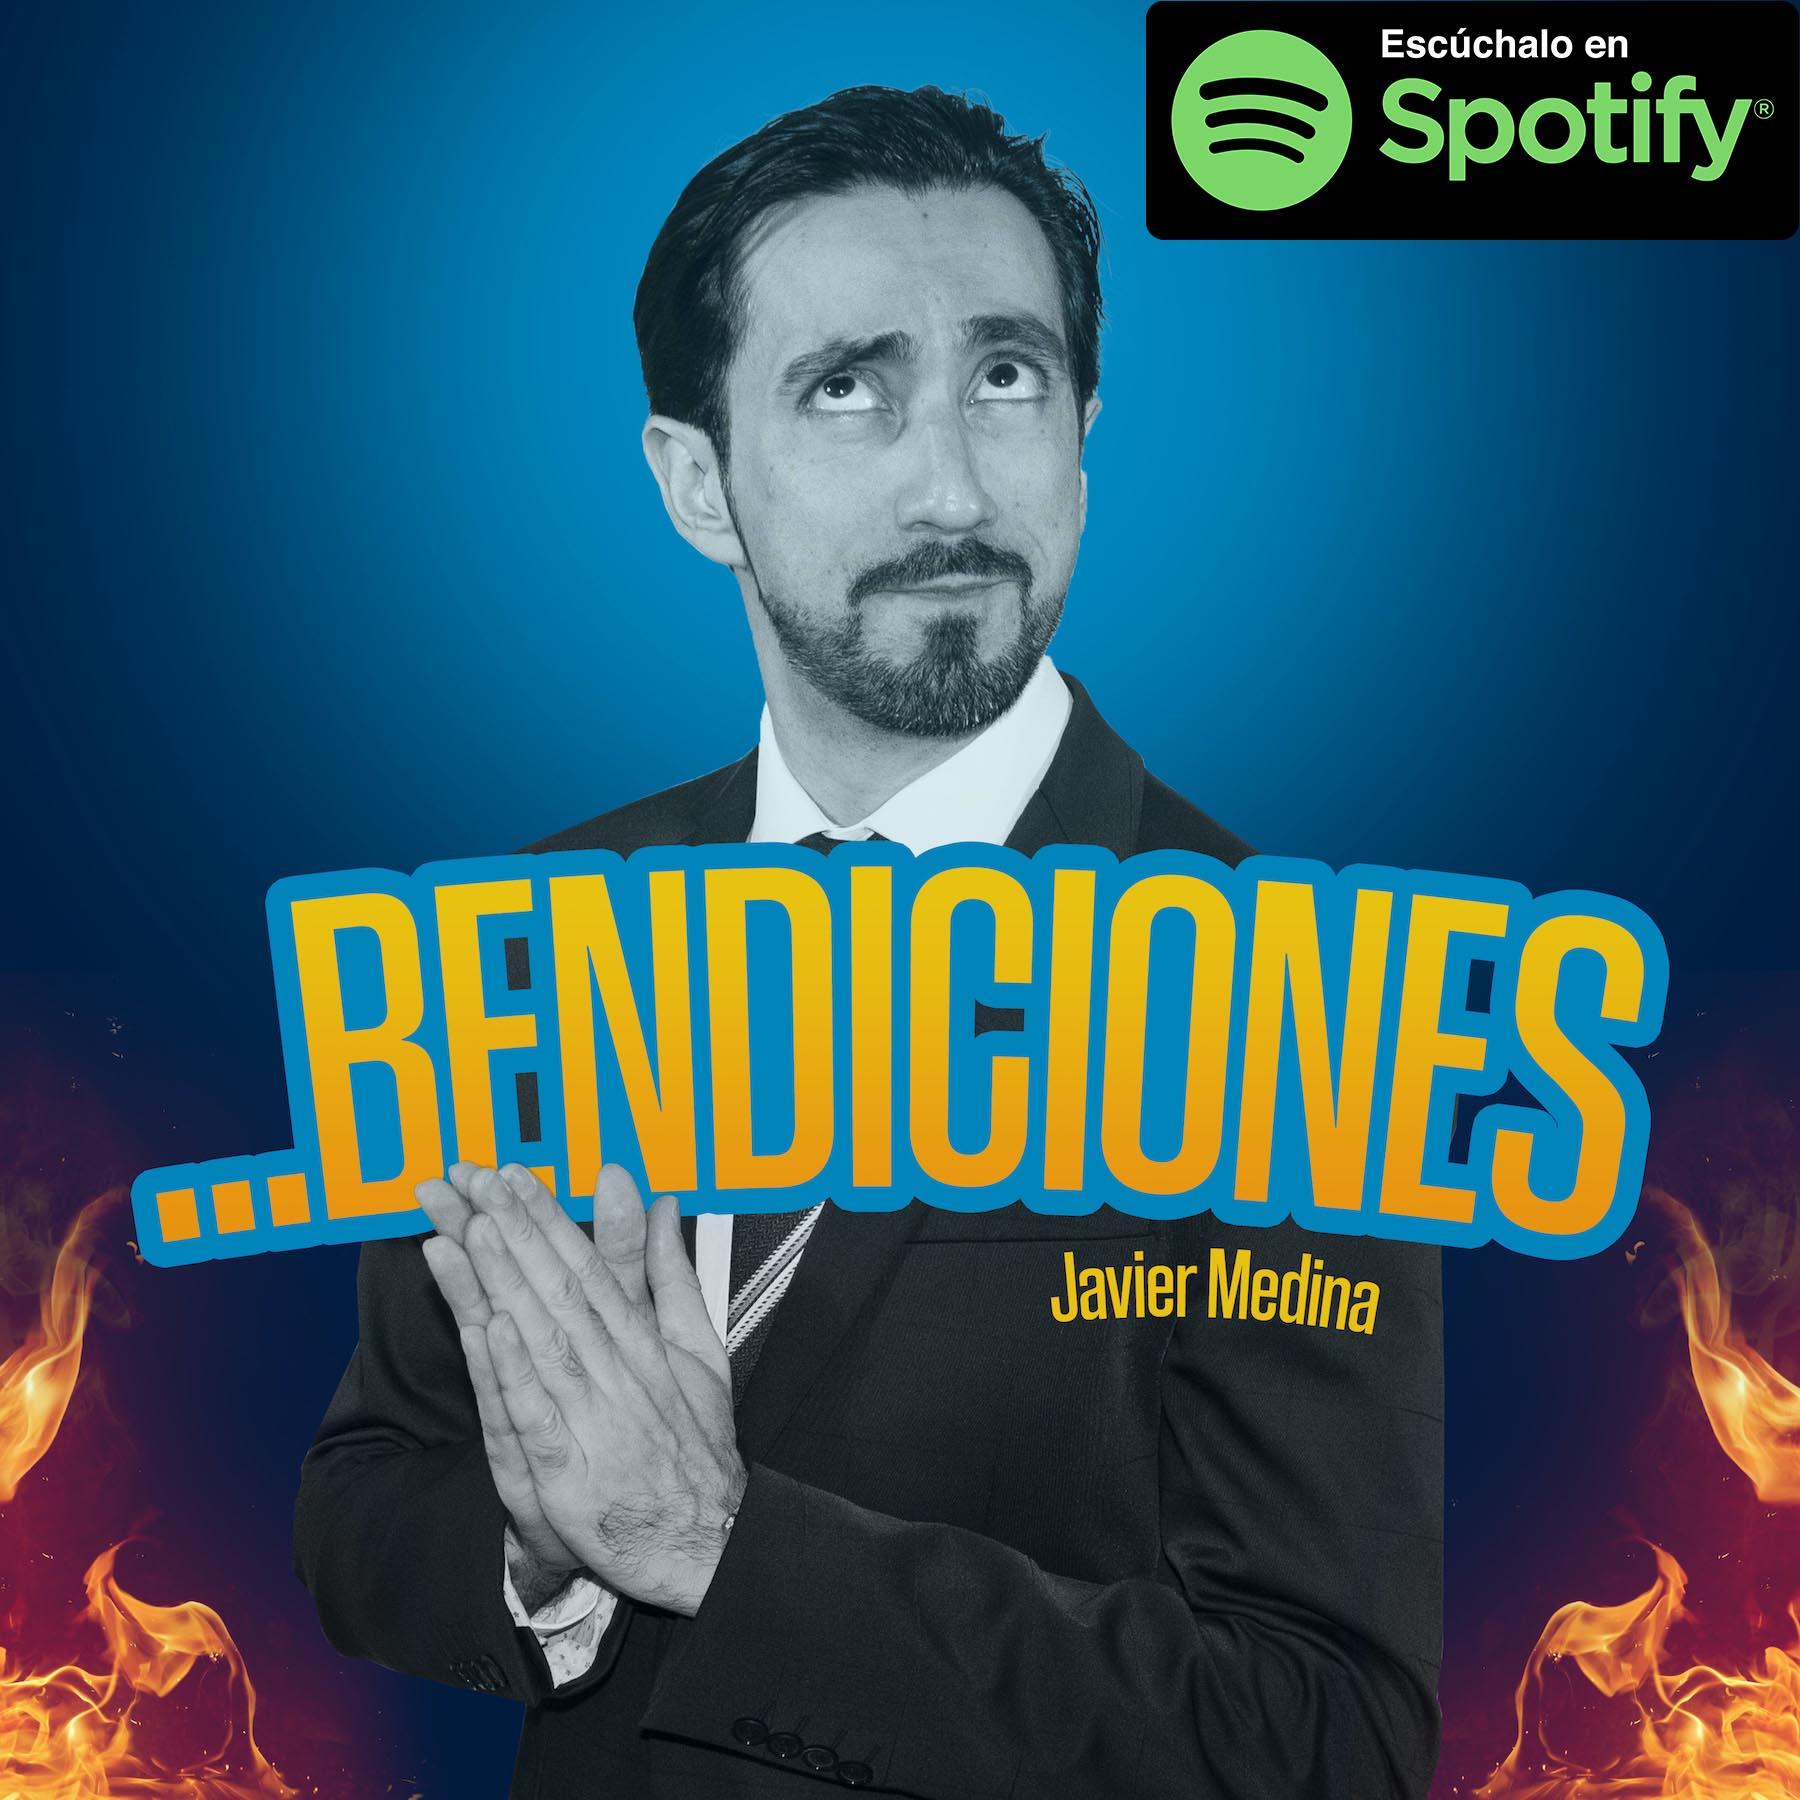 Javier Medina Bendiciones Spotify